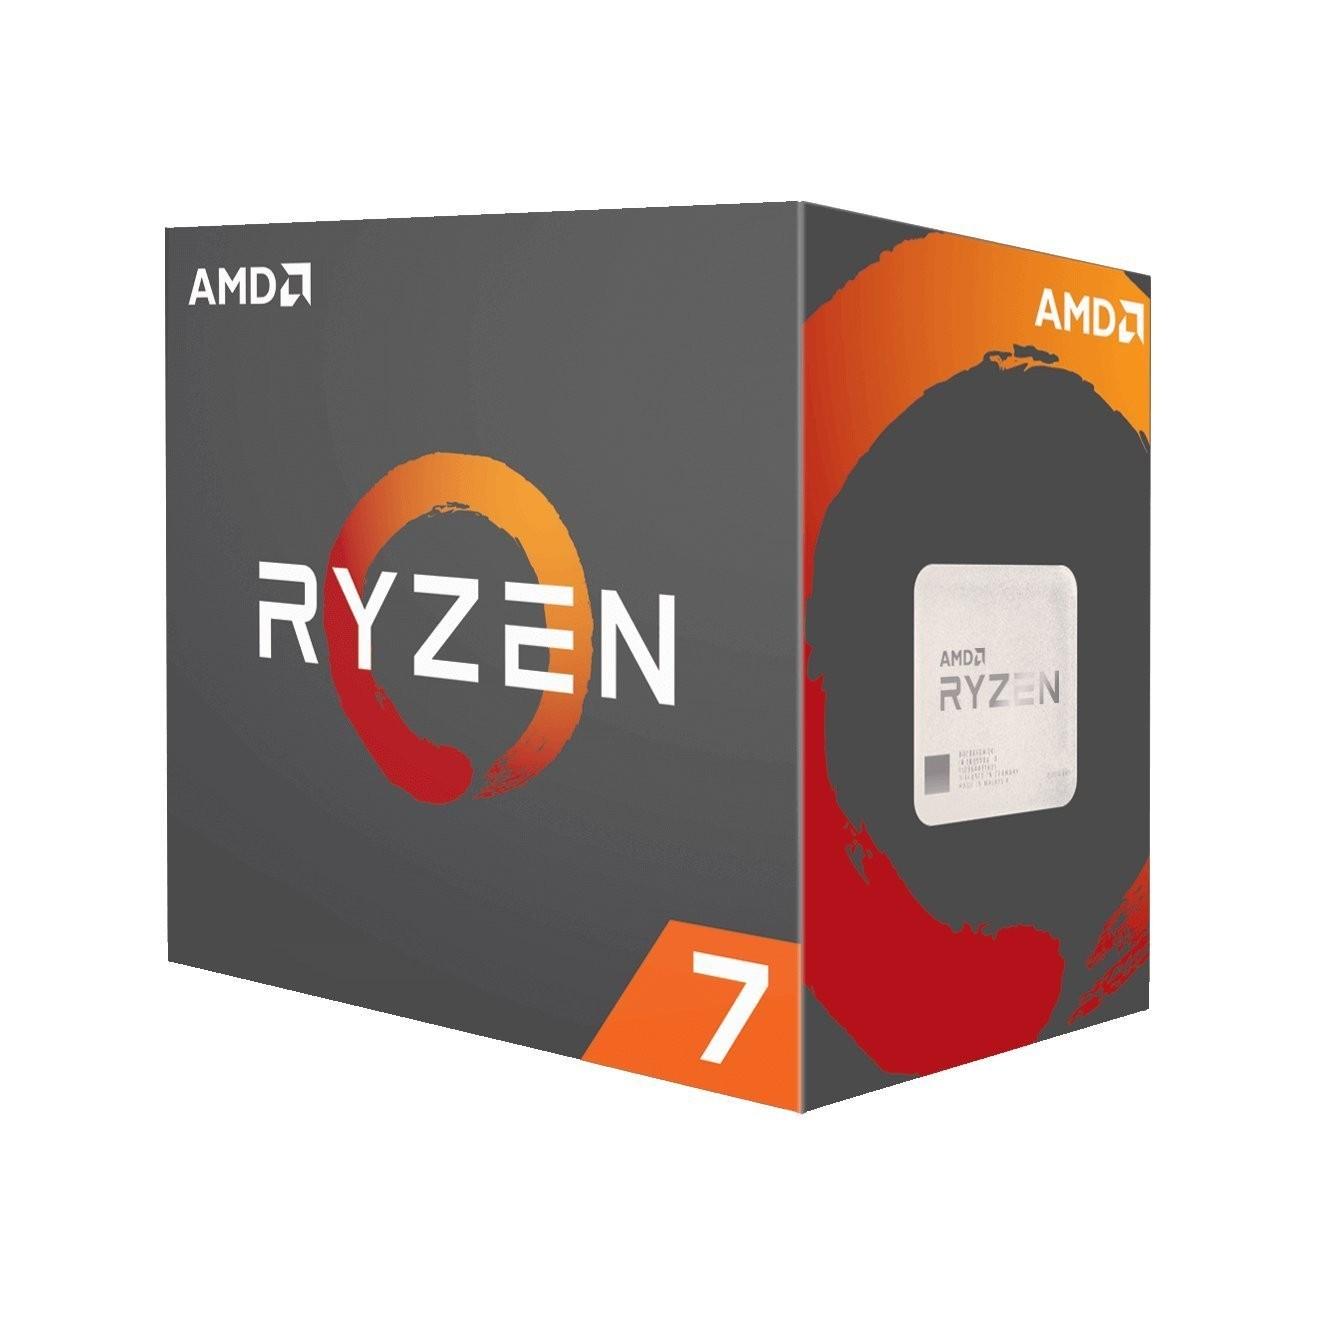 AMD CPU RYZEN 7 1700X - 8-CORE 3.4GHZ SOCKET AM4 - DESKTOP PROCESSOR - YD170XBCAEWOF